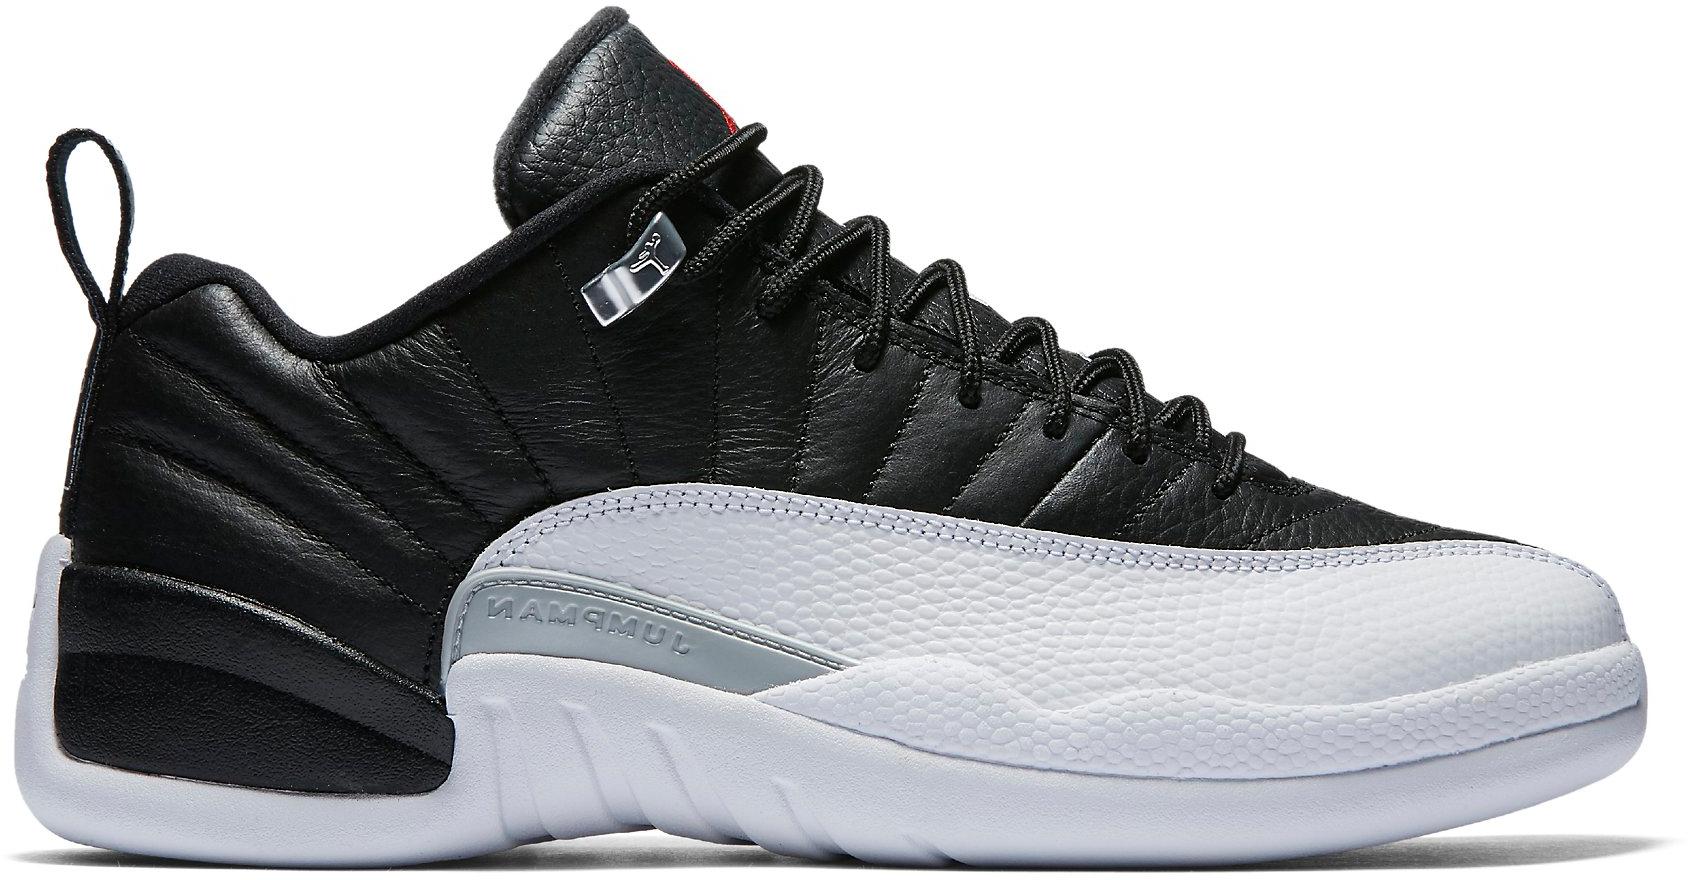 Jordan 12 Retro Low Playoffs